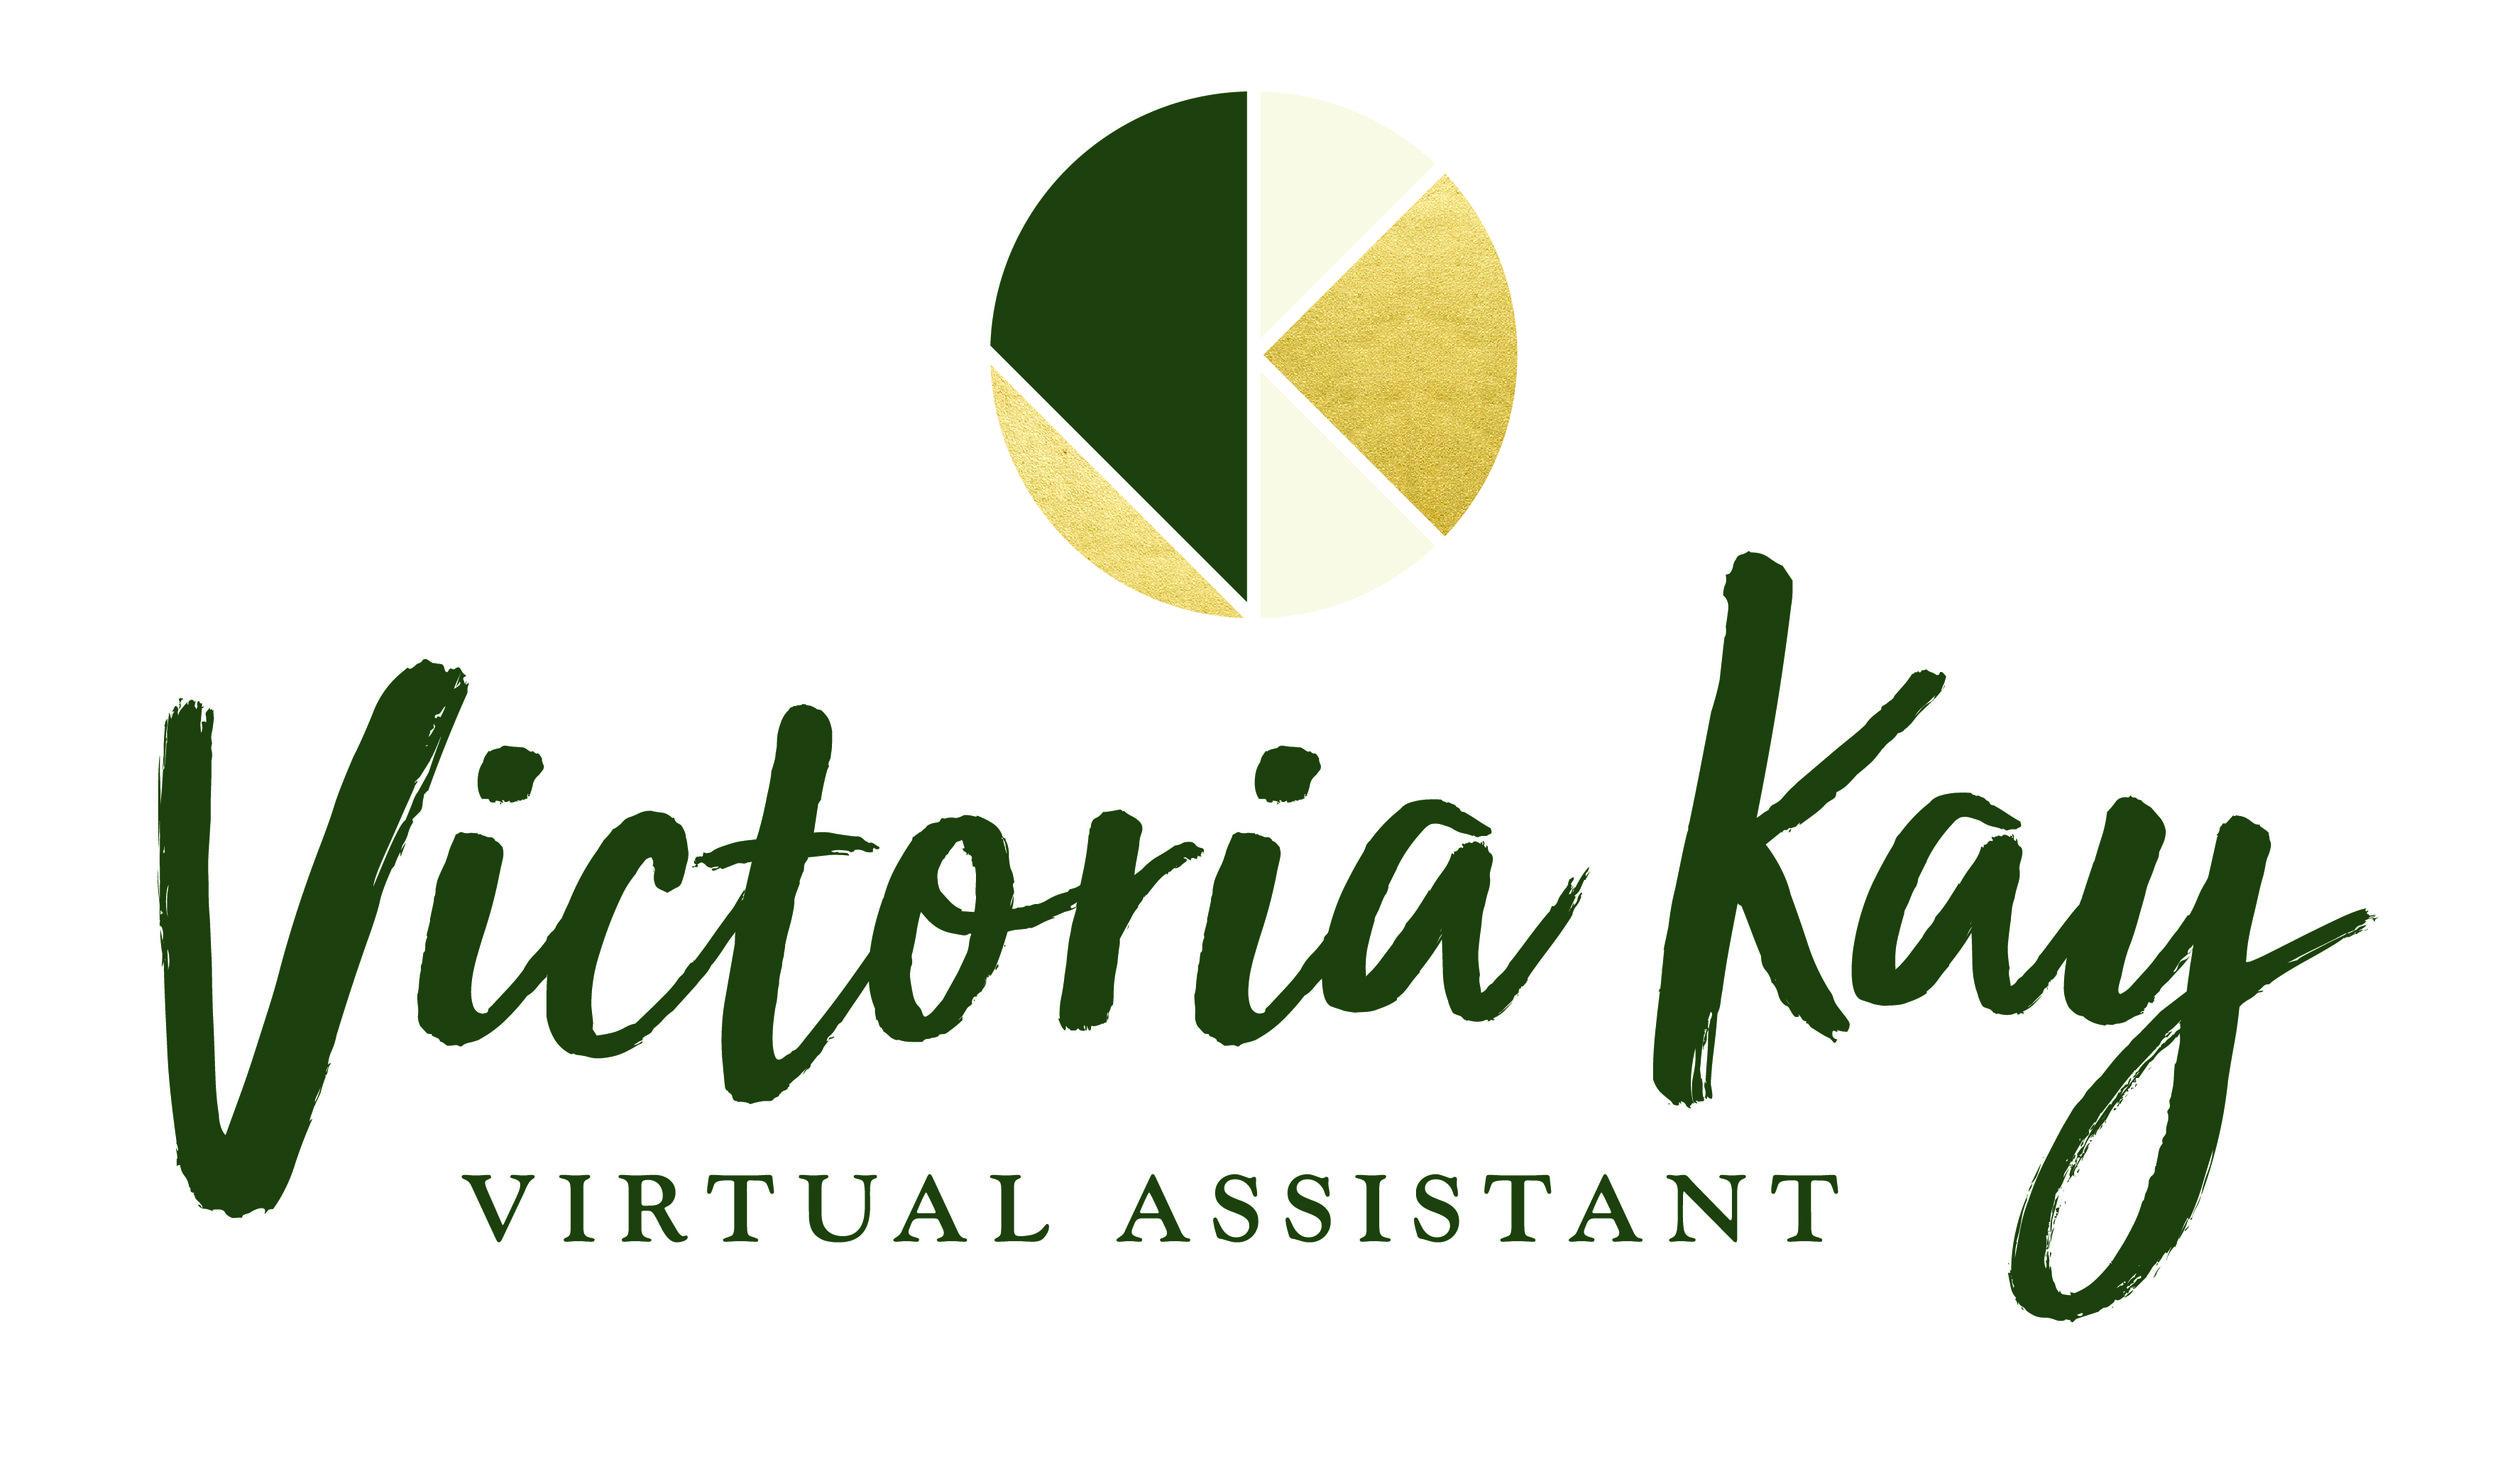 VK Logo.jpg